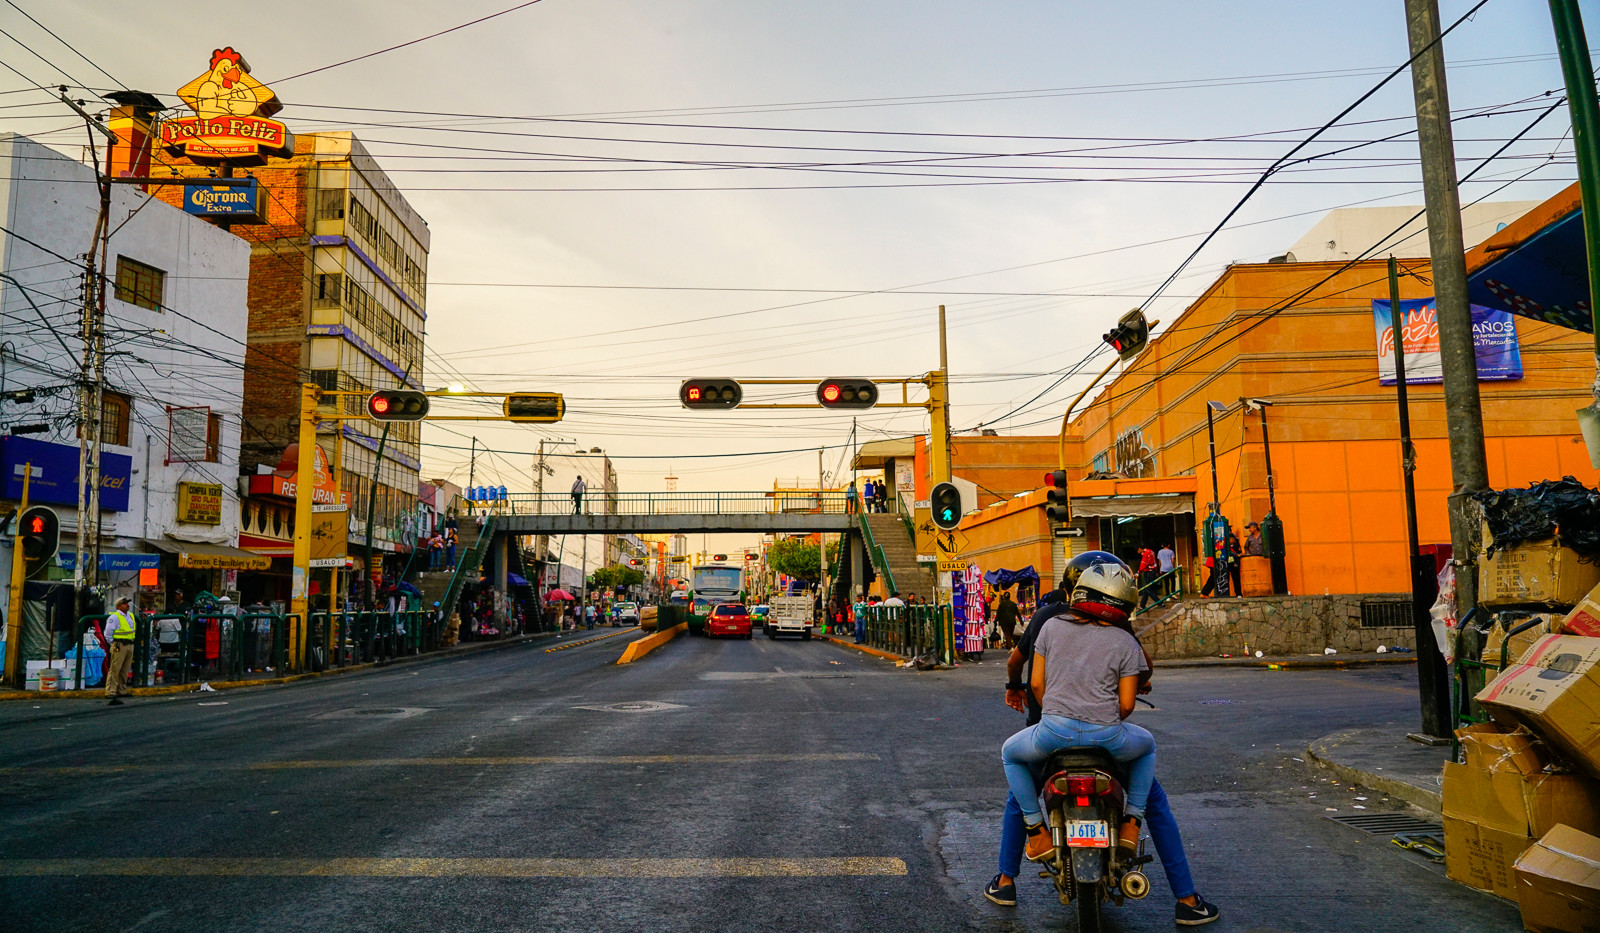 Mexico007.jpg